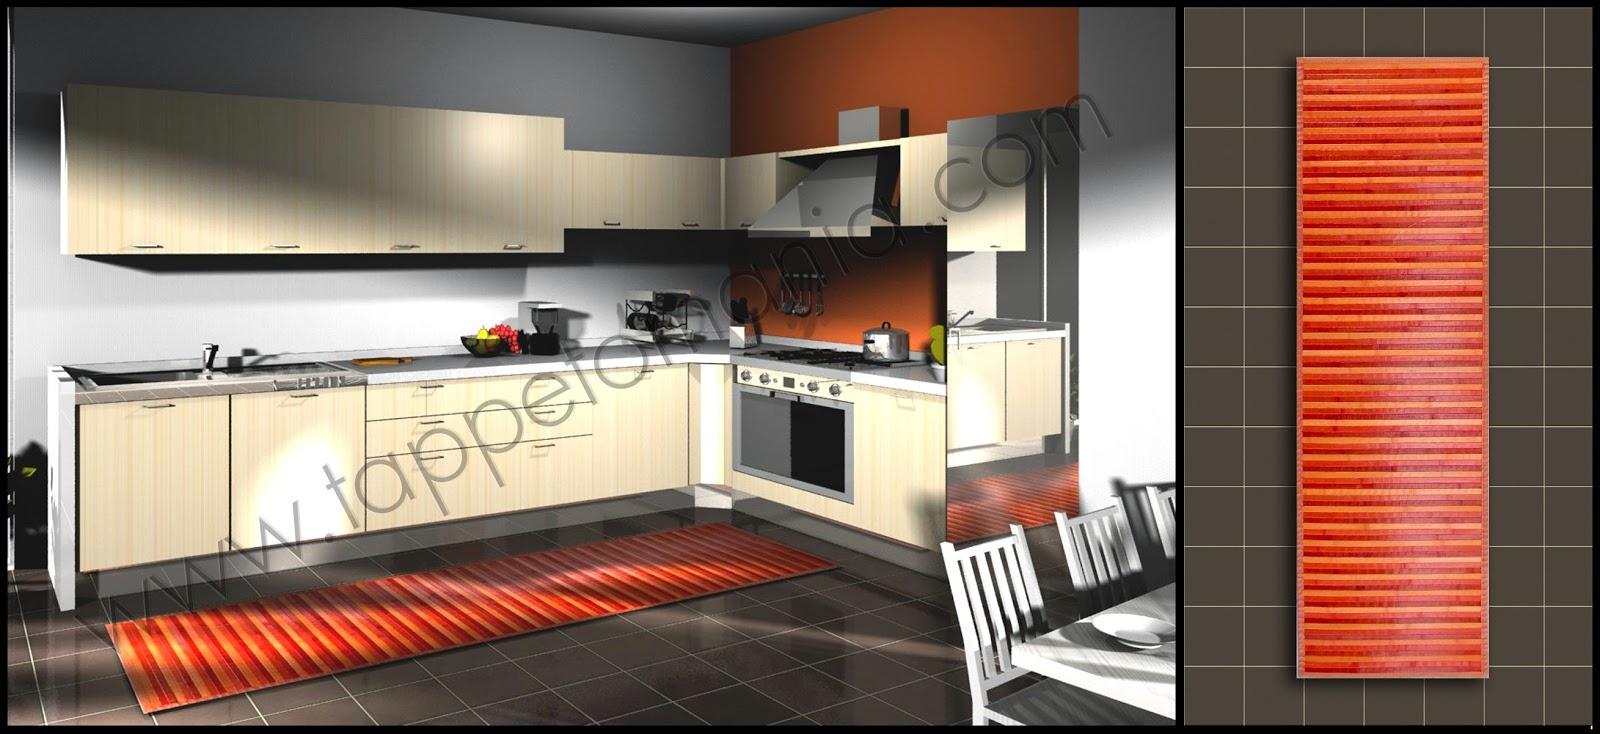 Prezzi outlet su tappetini tappeti da cucina tappetomania - Tappetini da cucina ...